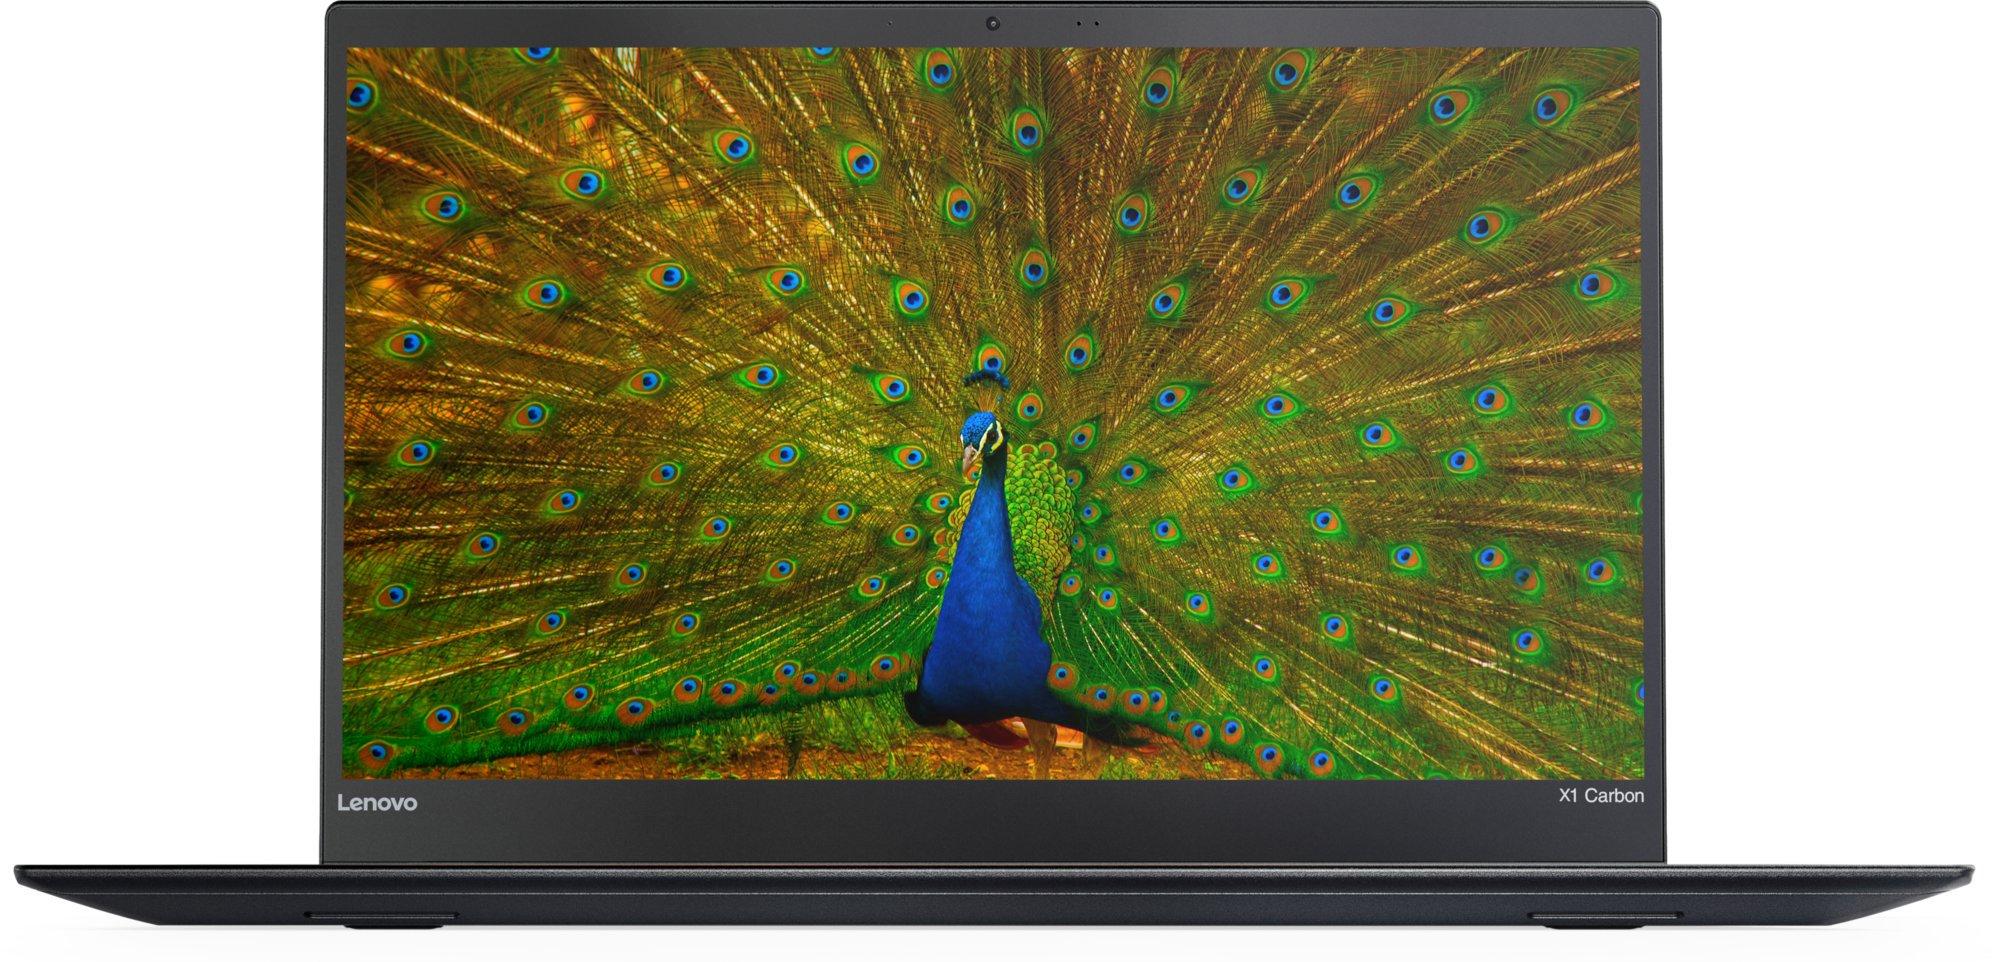 Lenovo ThinkPad X1 Carbon 5th